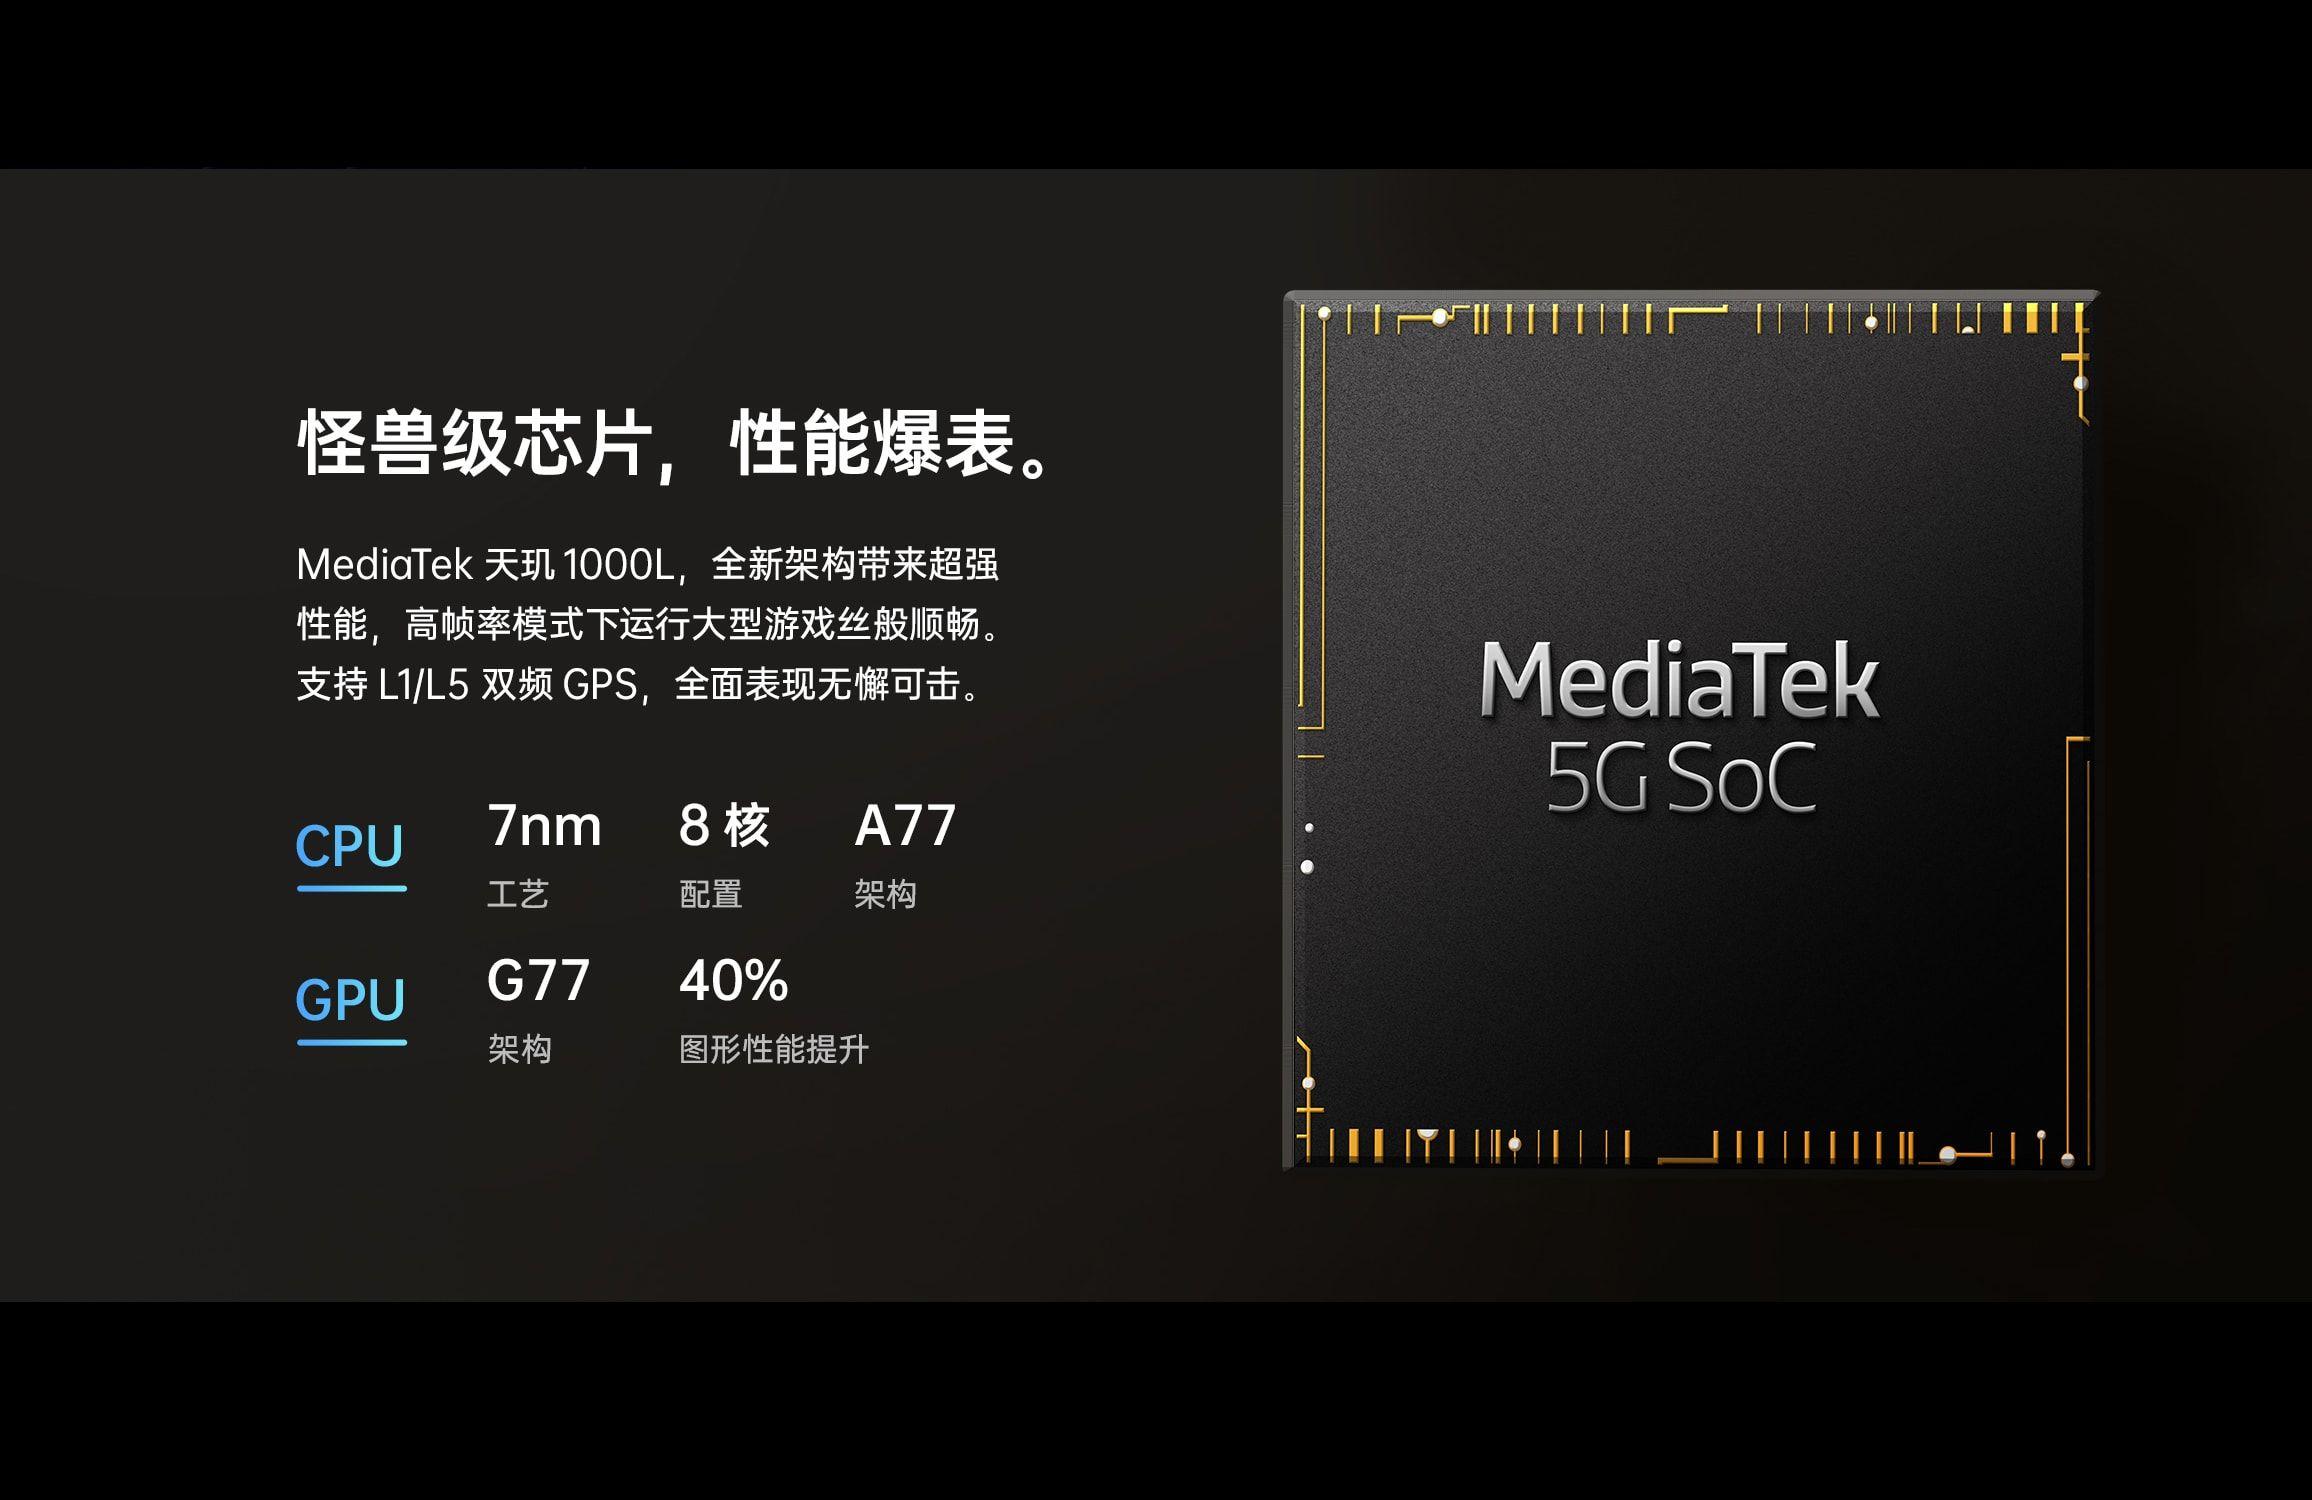 MediaTek Dimensity 1000Lのスペックが判明、Dimensity 1000の低クロック版